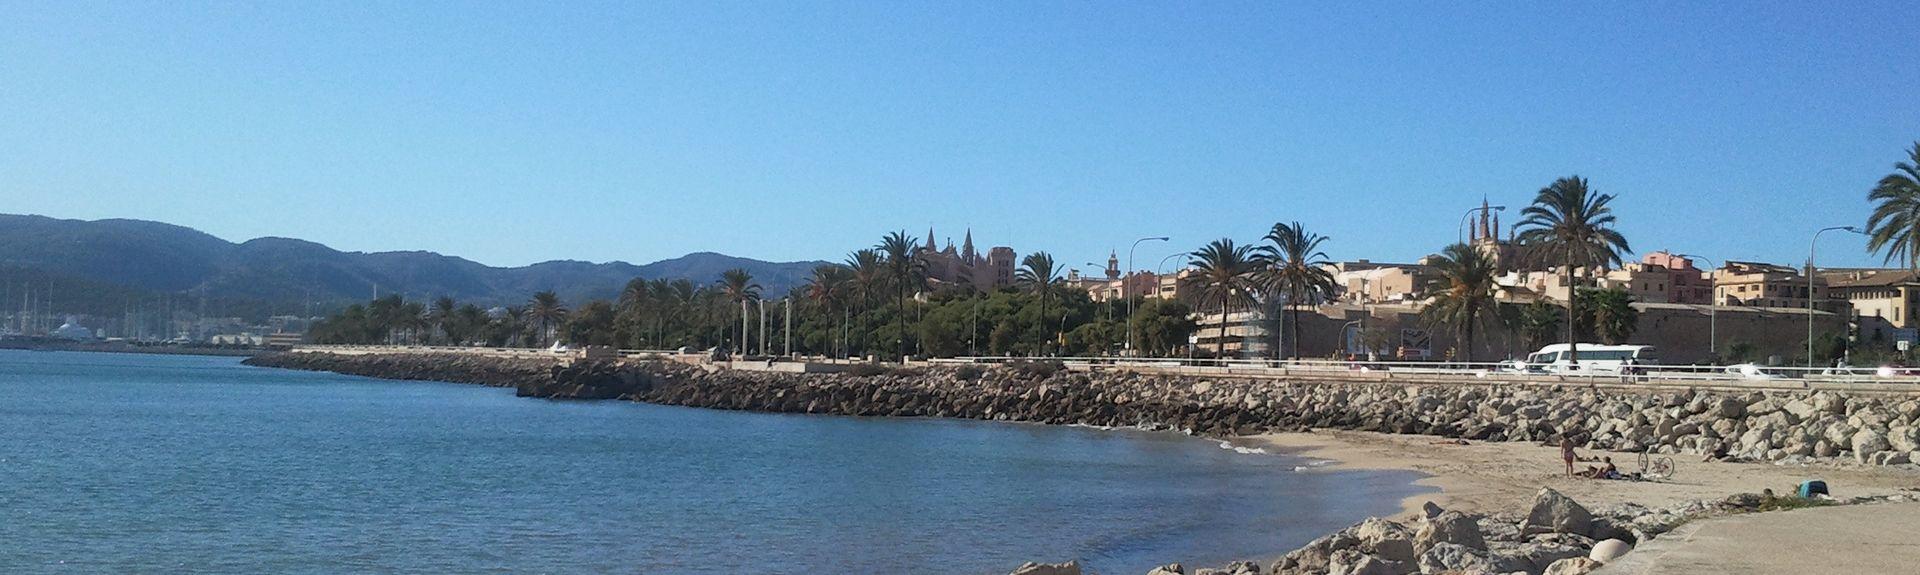 Paseo Maritimo, Palma, Balearic Islands, Spain